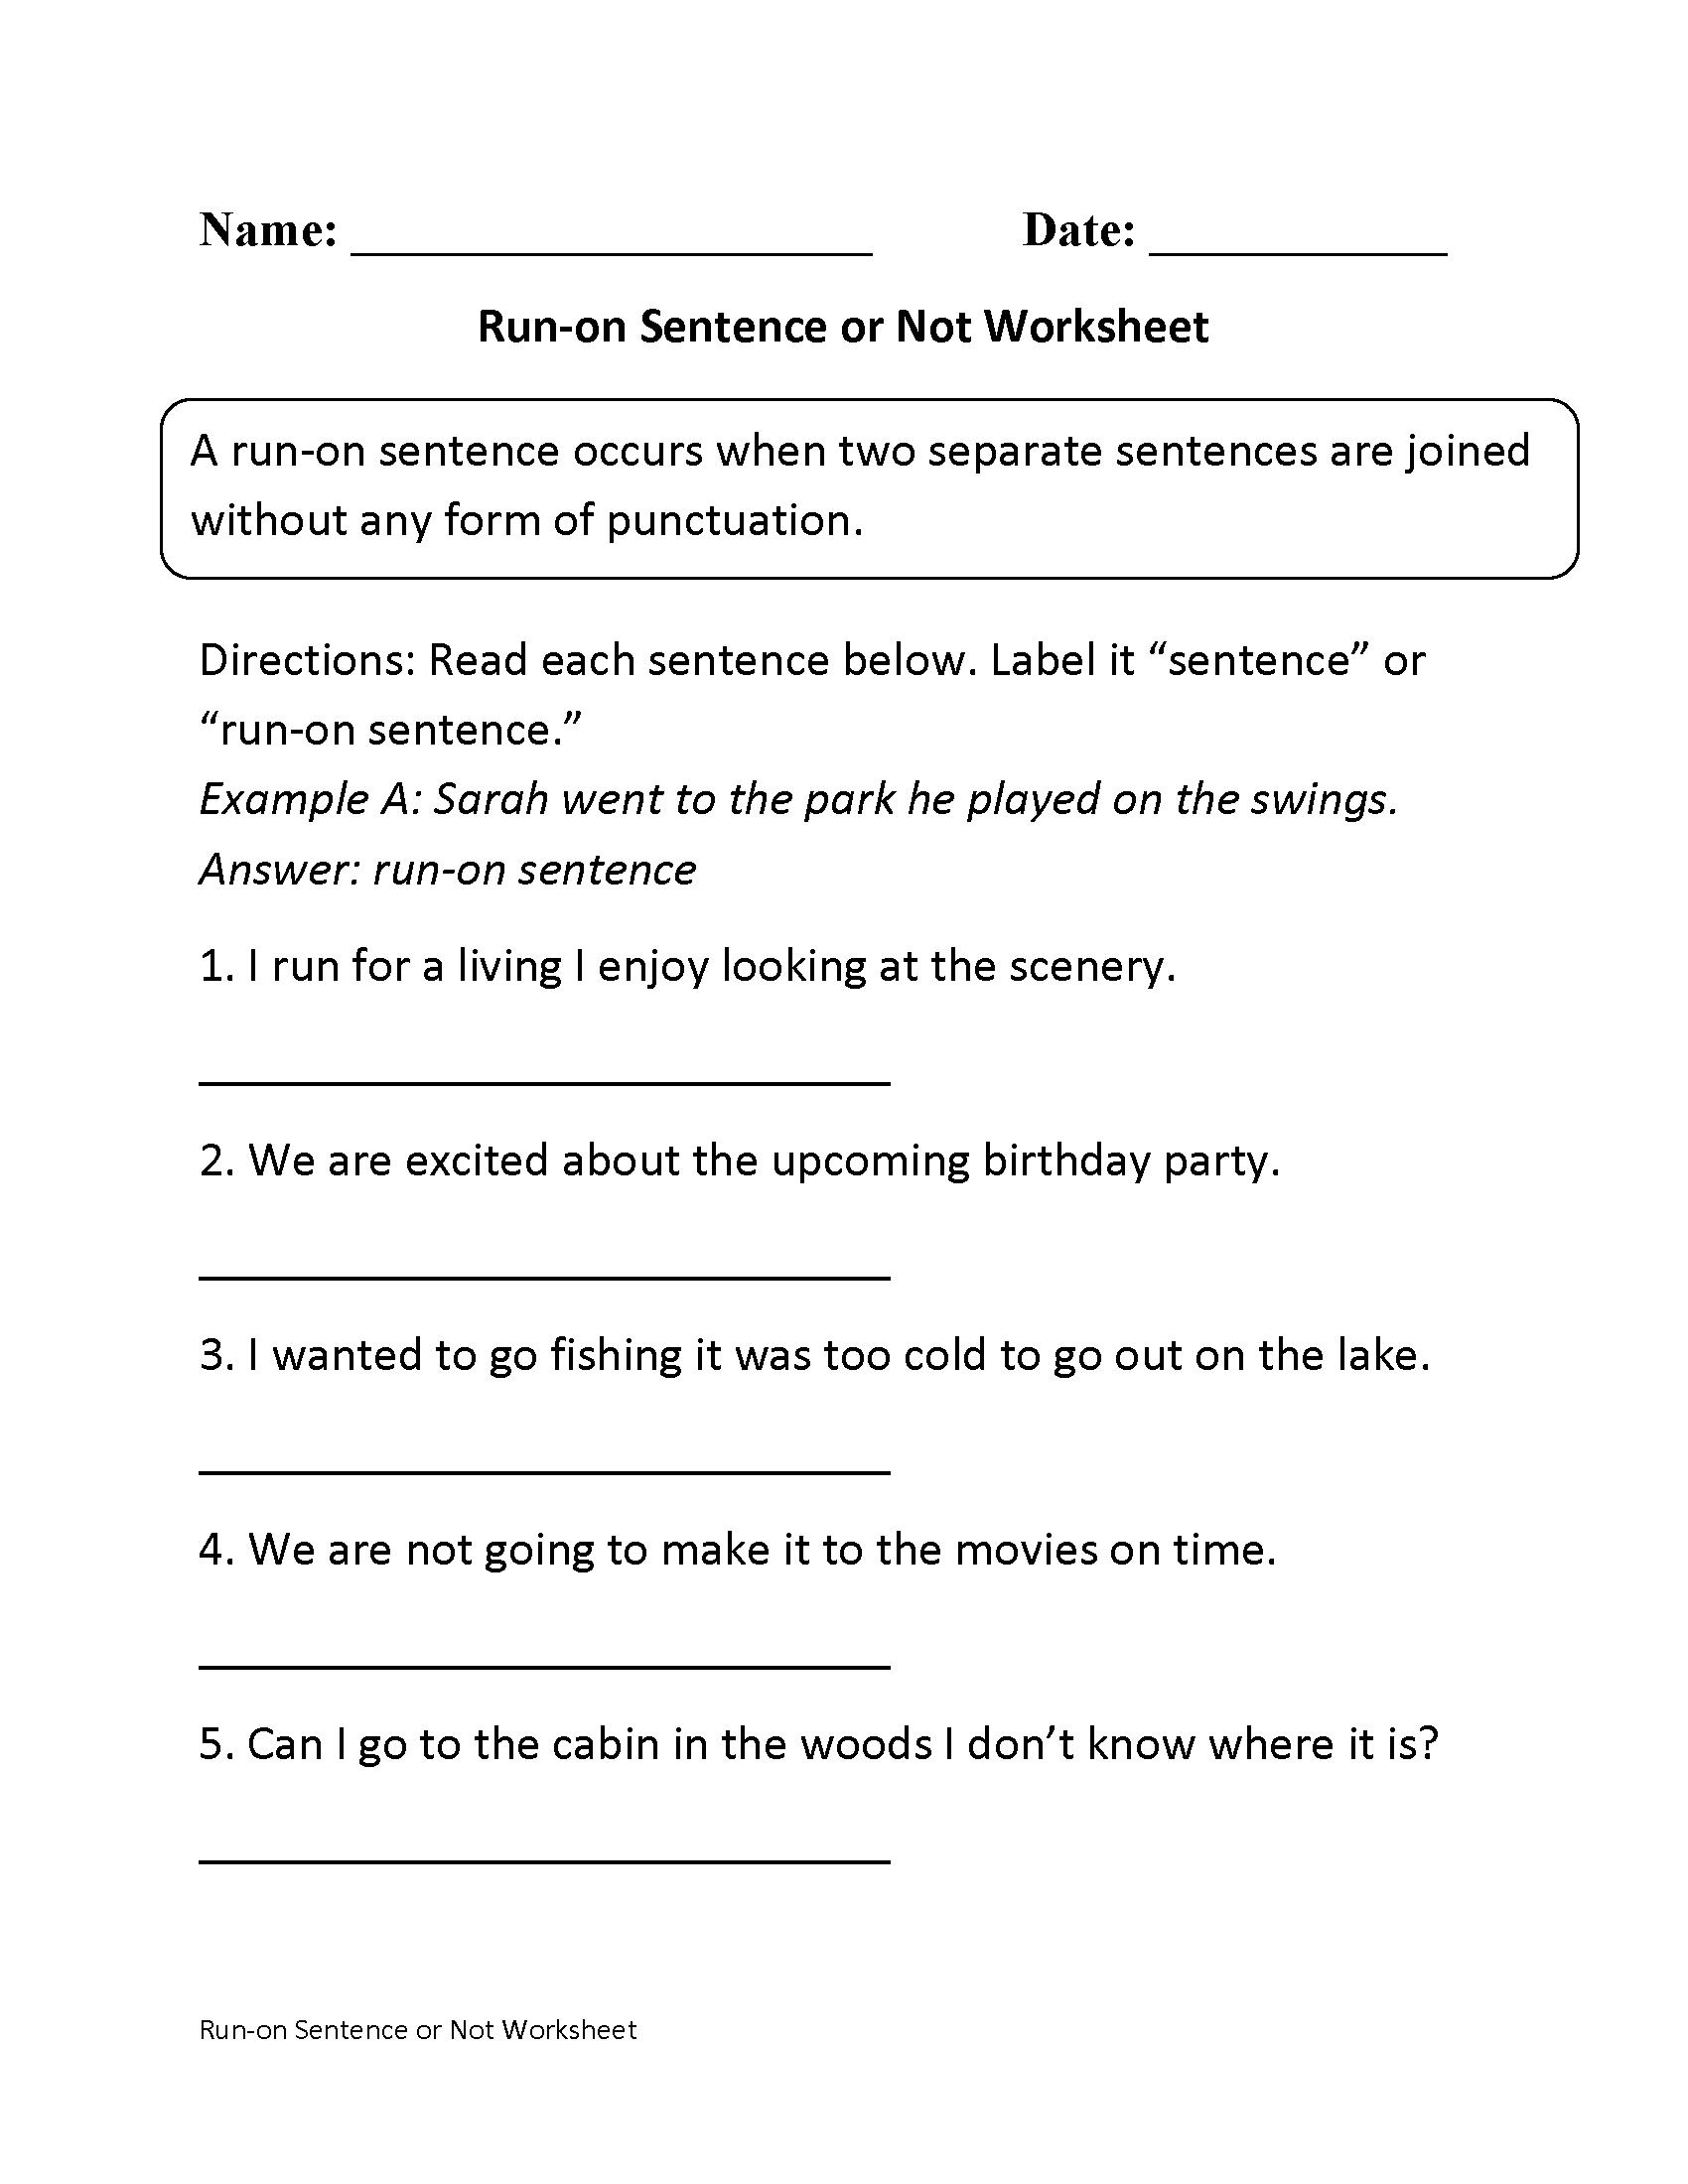 Sentences Worksheets | Run On Sentences Worksheets | Free Printable Worksheets On Run On Sentences